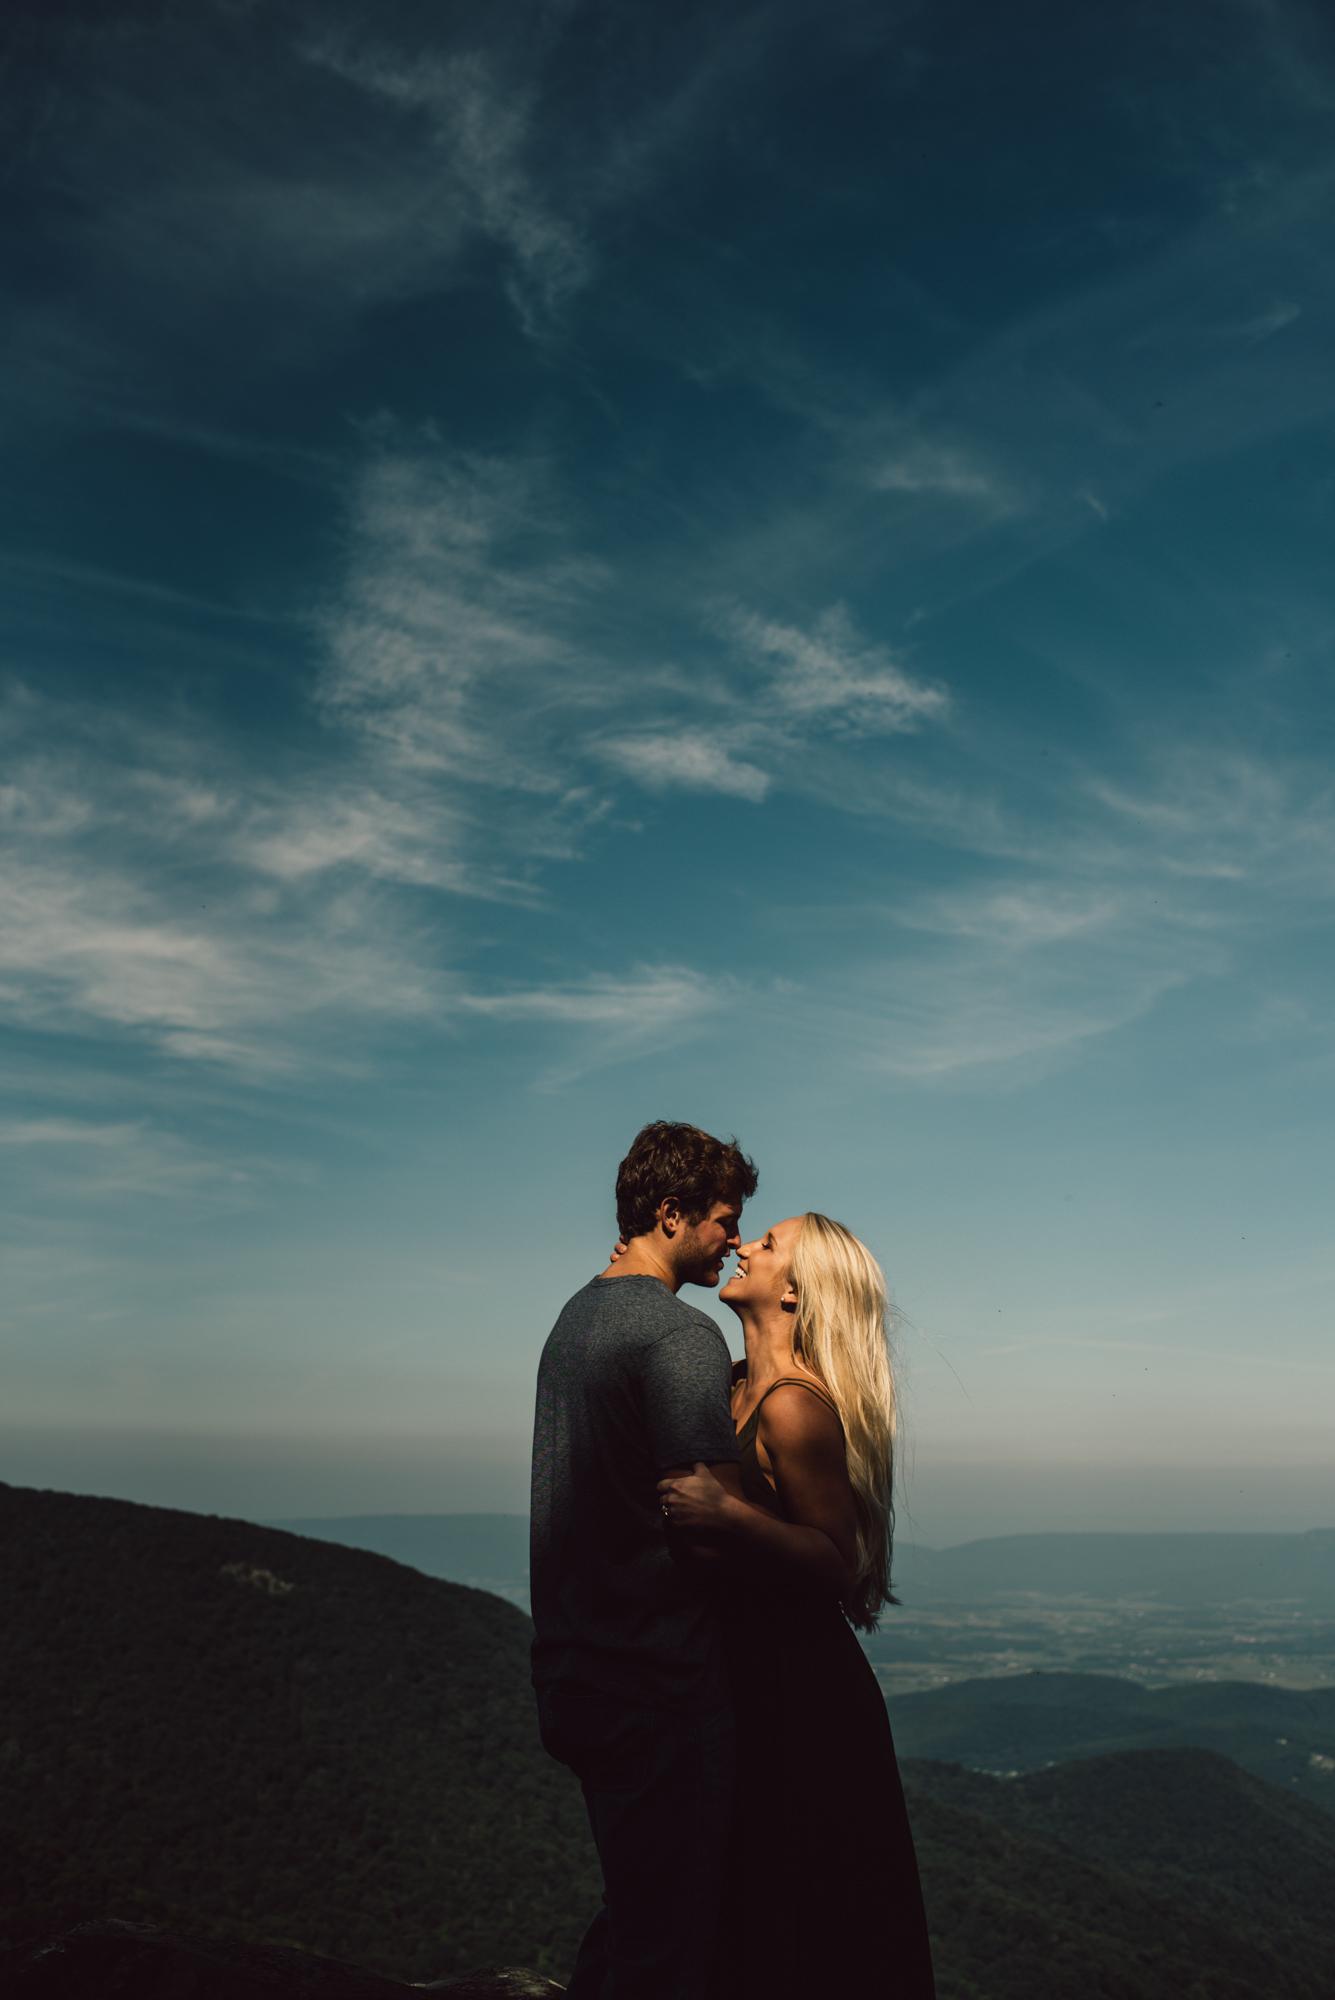 Jp and Kelsey - Shenandoah National Park - Couple Portraits - Adventure Session_53.JPG